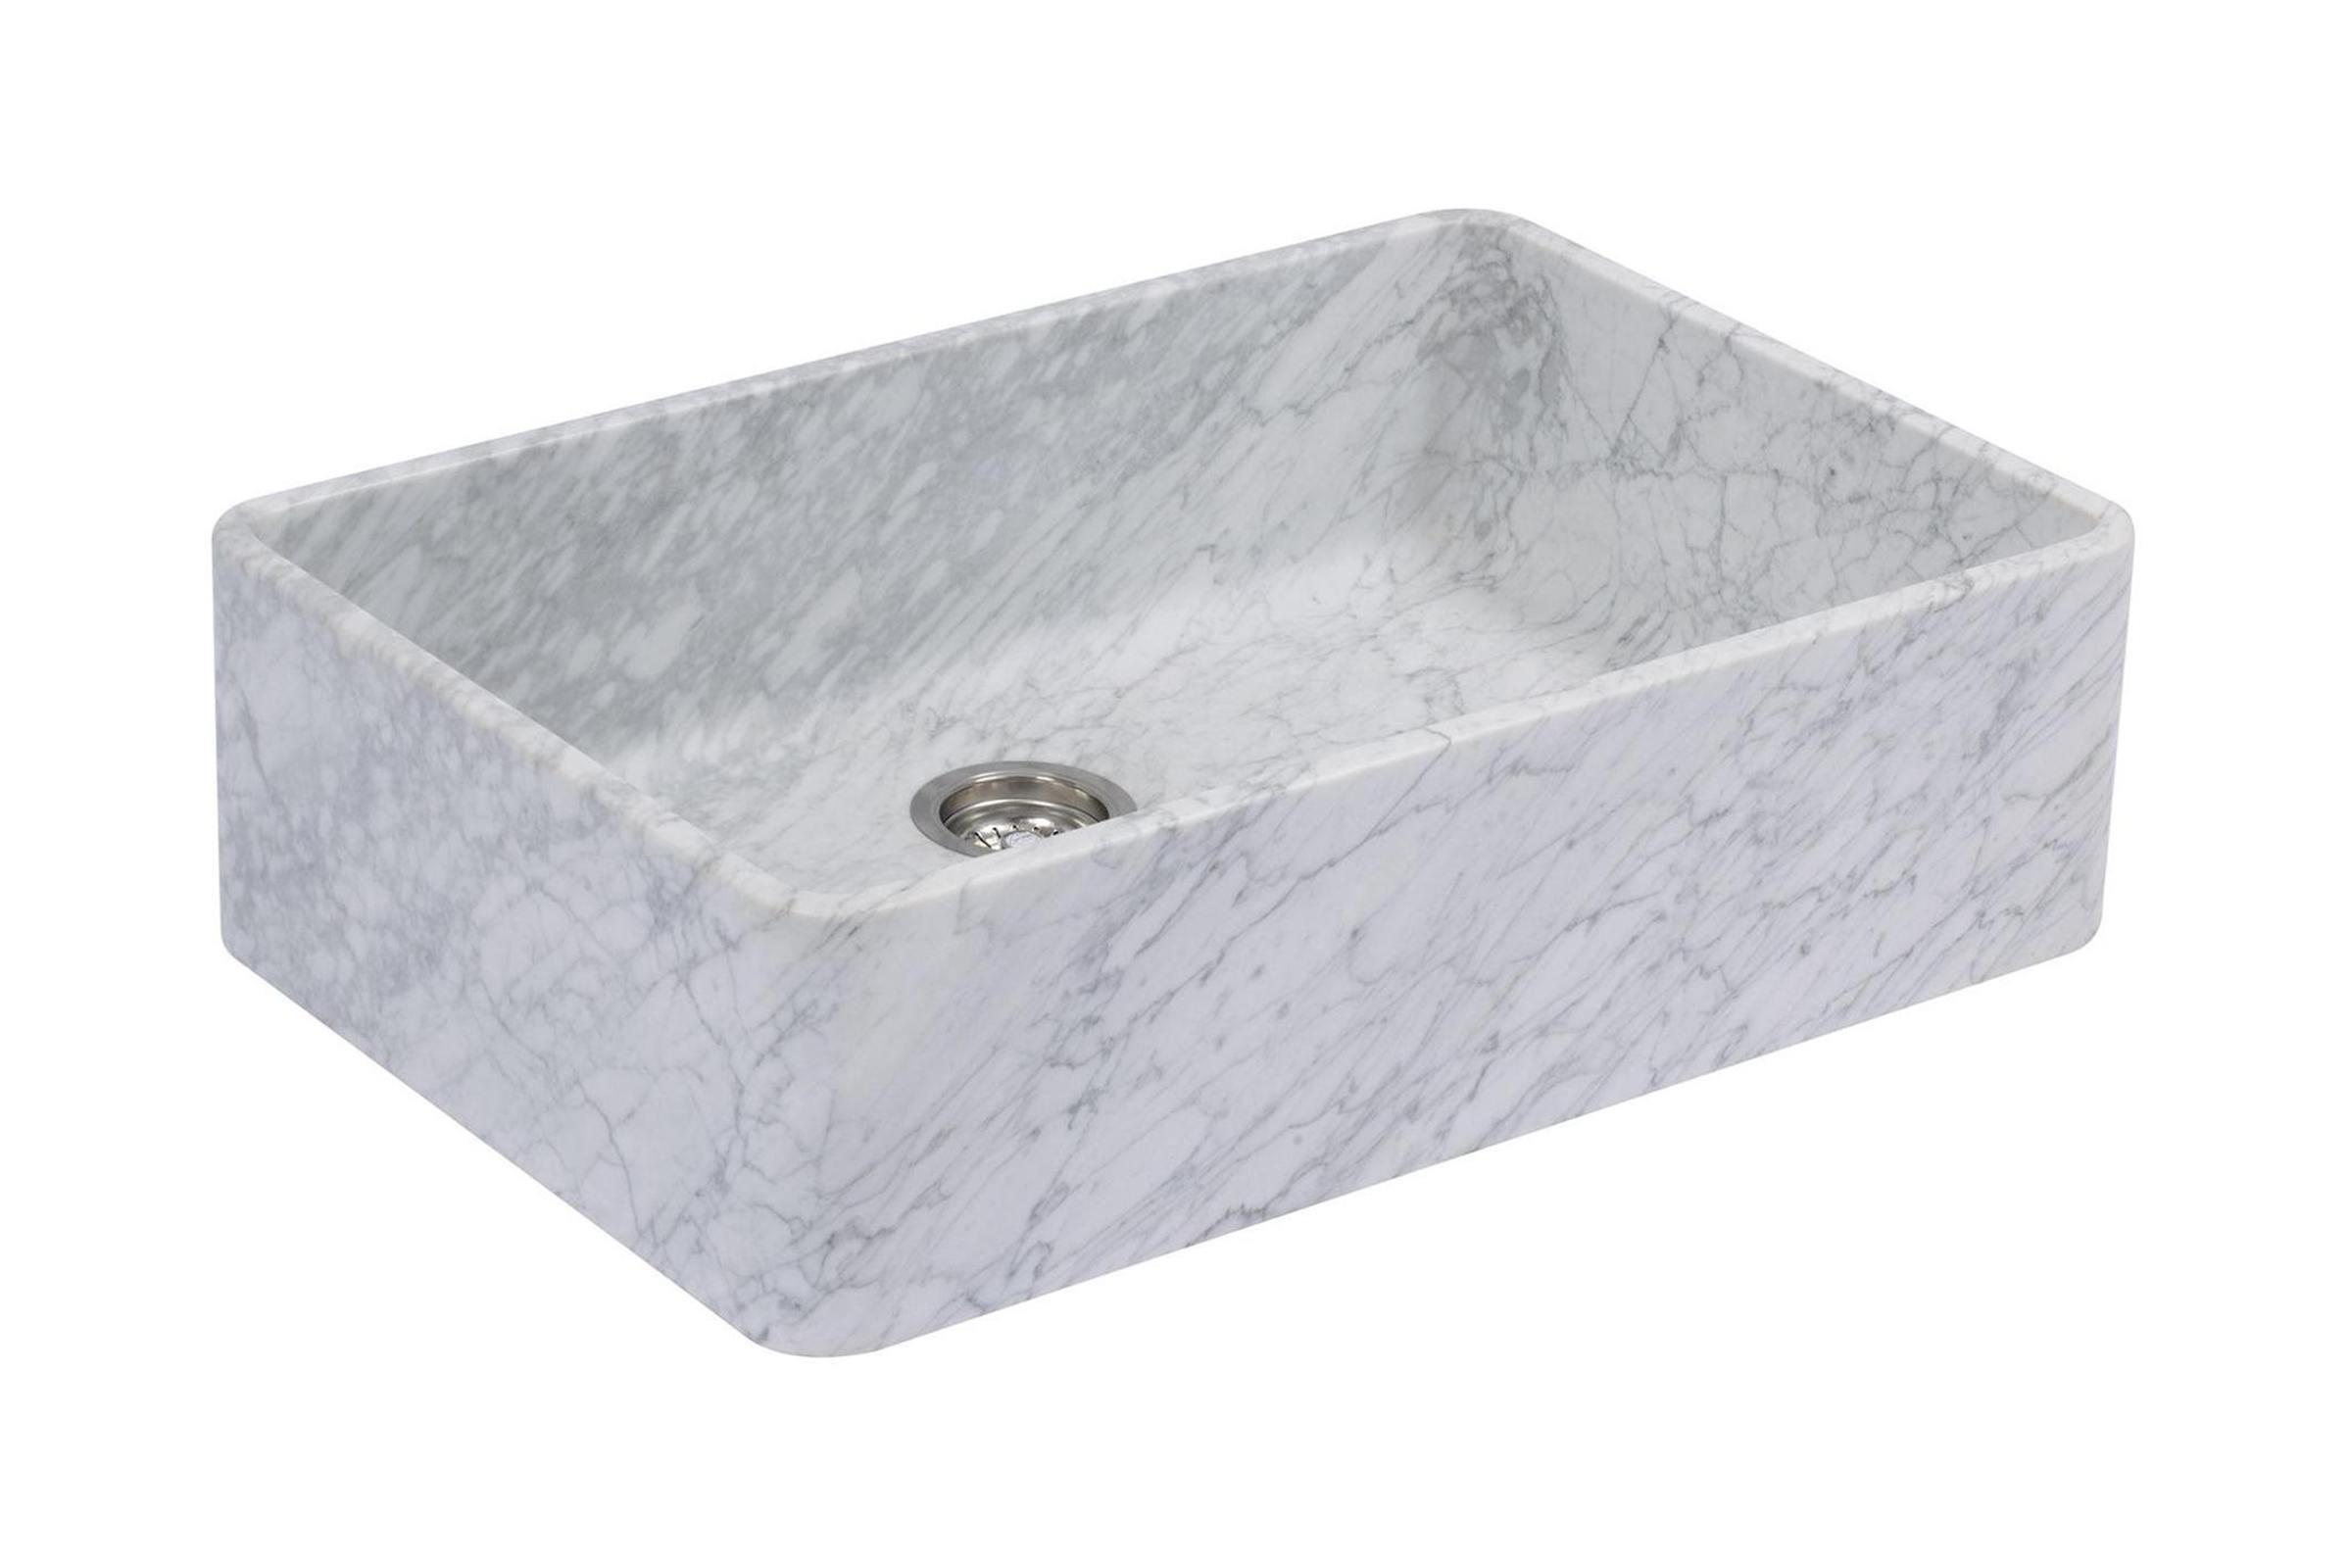 Milano Penthouse 800 Single Marble Sink photo 1